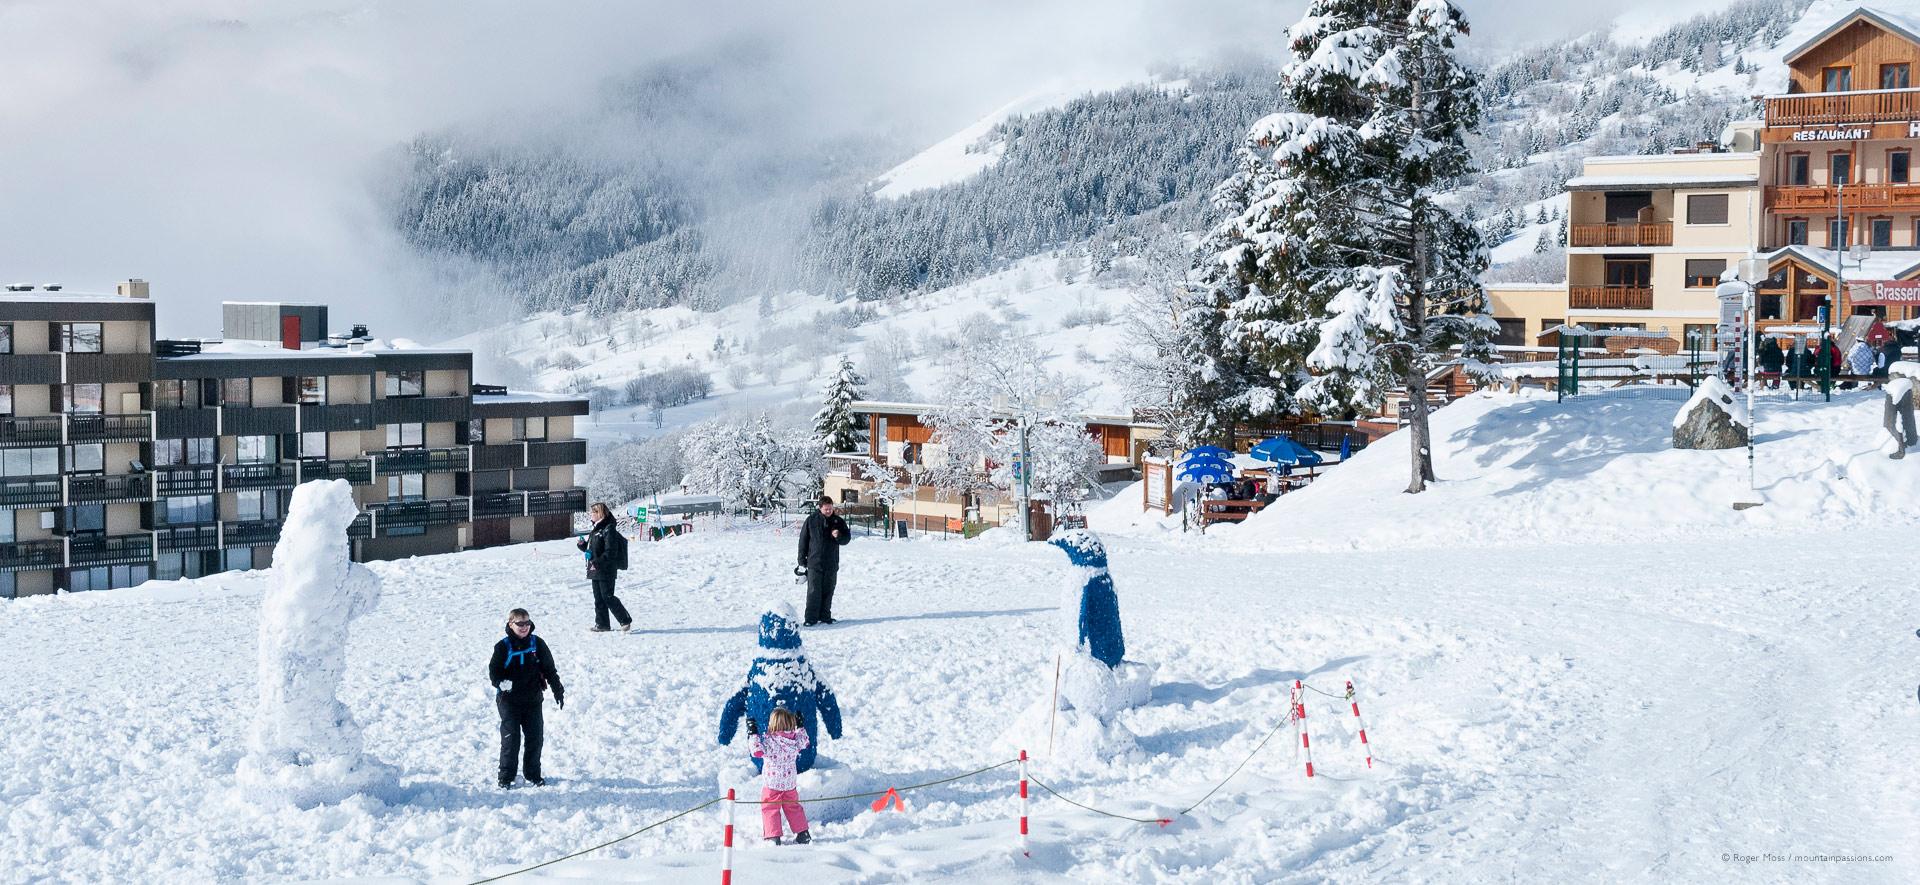 Families enjoying fresh snow at the ski village of Saint-Francois Longchamp.